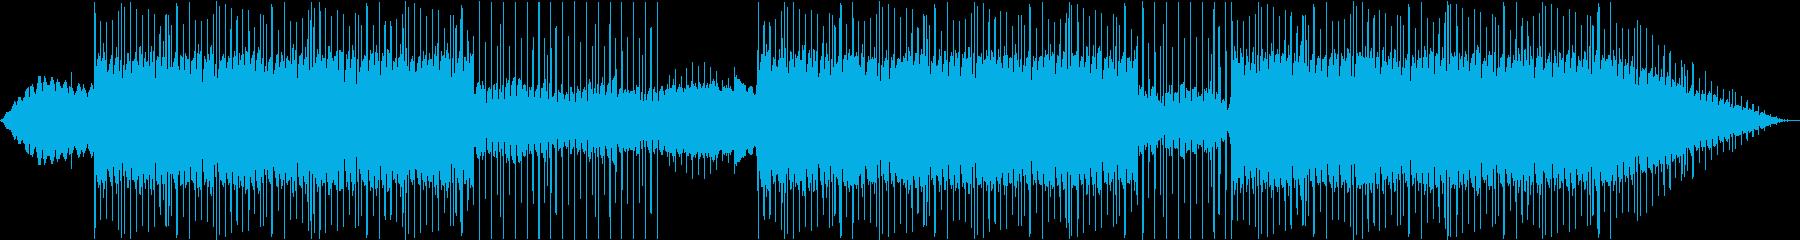 Lo-fi・ピアノ・オルガン・ビートの再生済みの波形